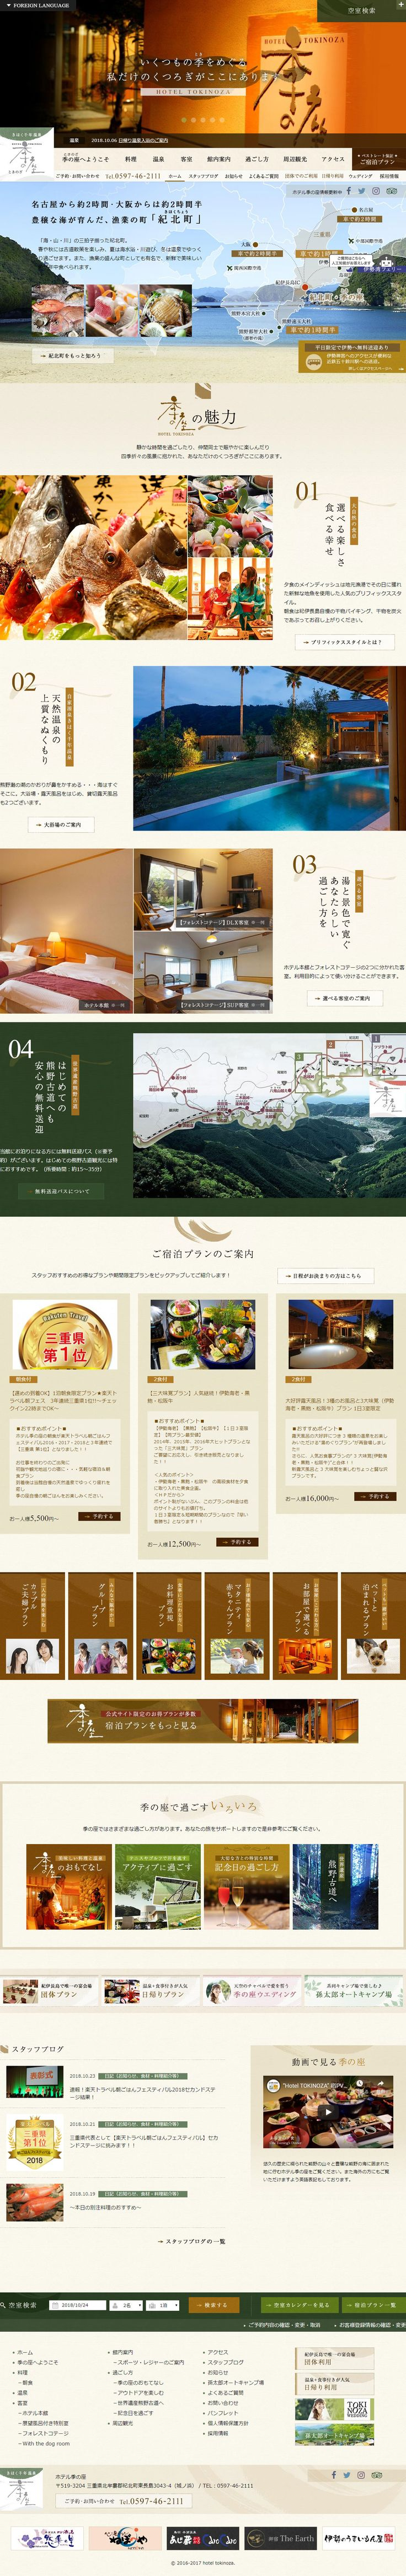 Webデザイン おしゃれまとめの人気アイデア Pinterest Inasawa Ayumi ウェブデザイン Webデザイン デザイン